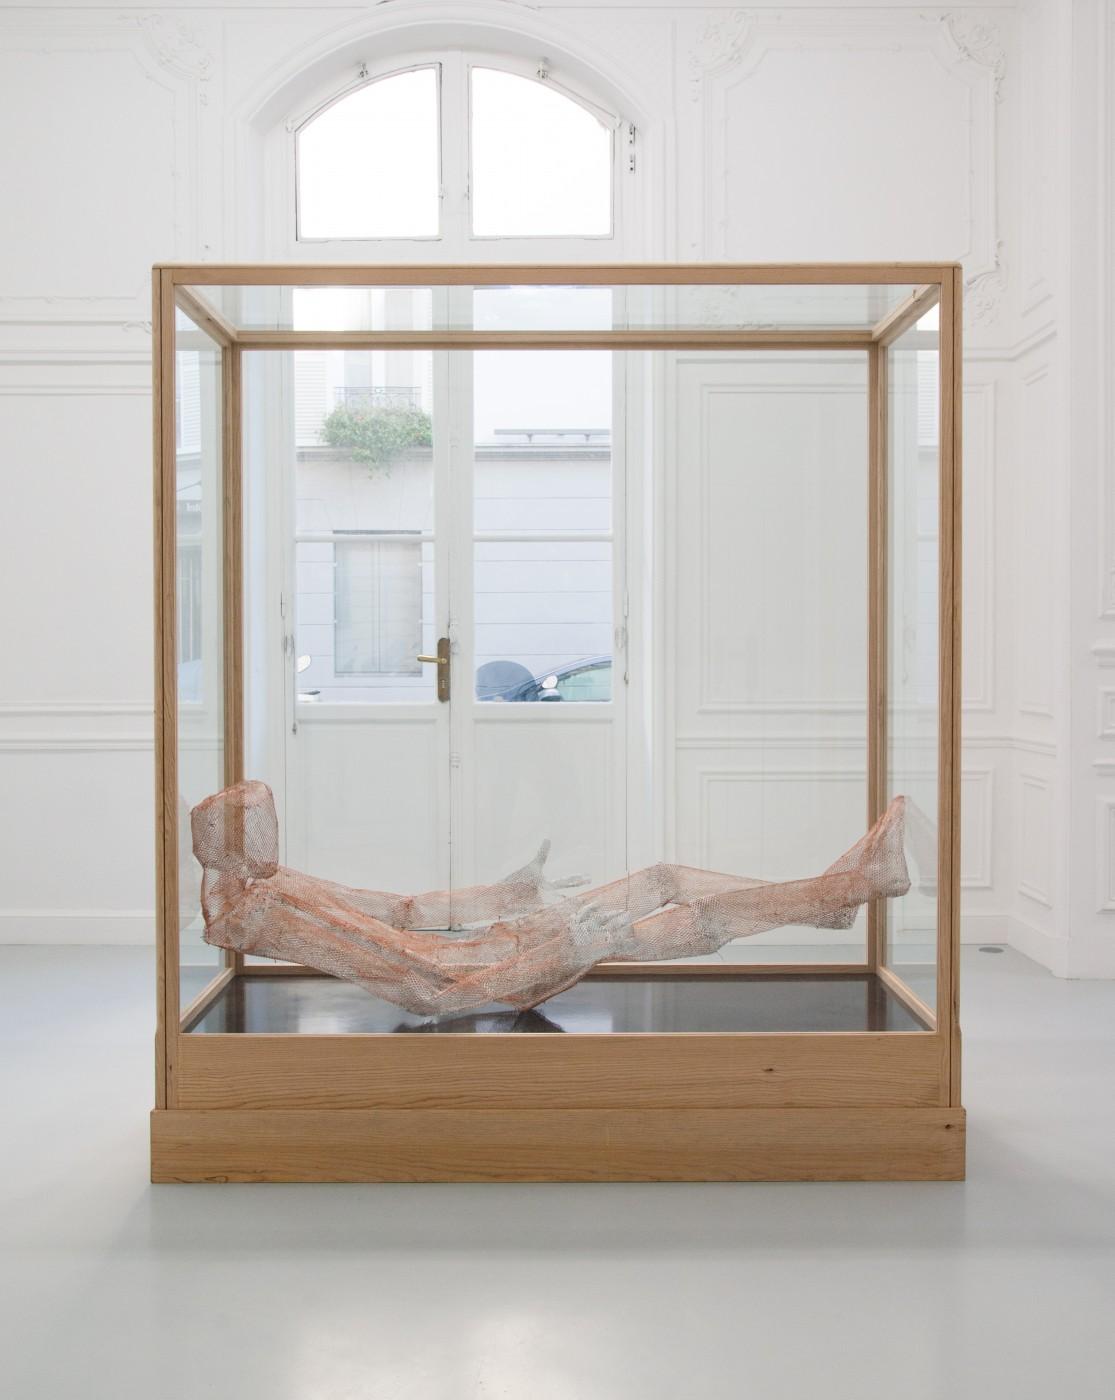 TOM HUMPHREYS  Figure Rouge</I>, 2018 Metal, paint, glass, wood 201 x 179 x 73 cm / 79.1 x 70.4 x 28.7 in